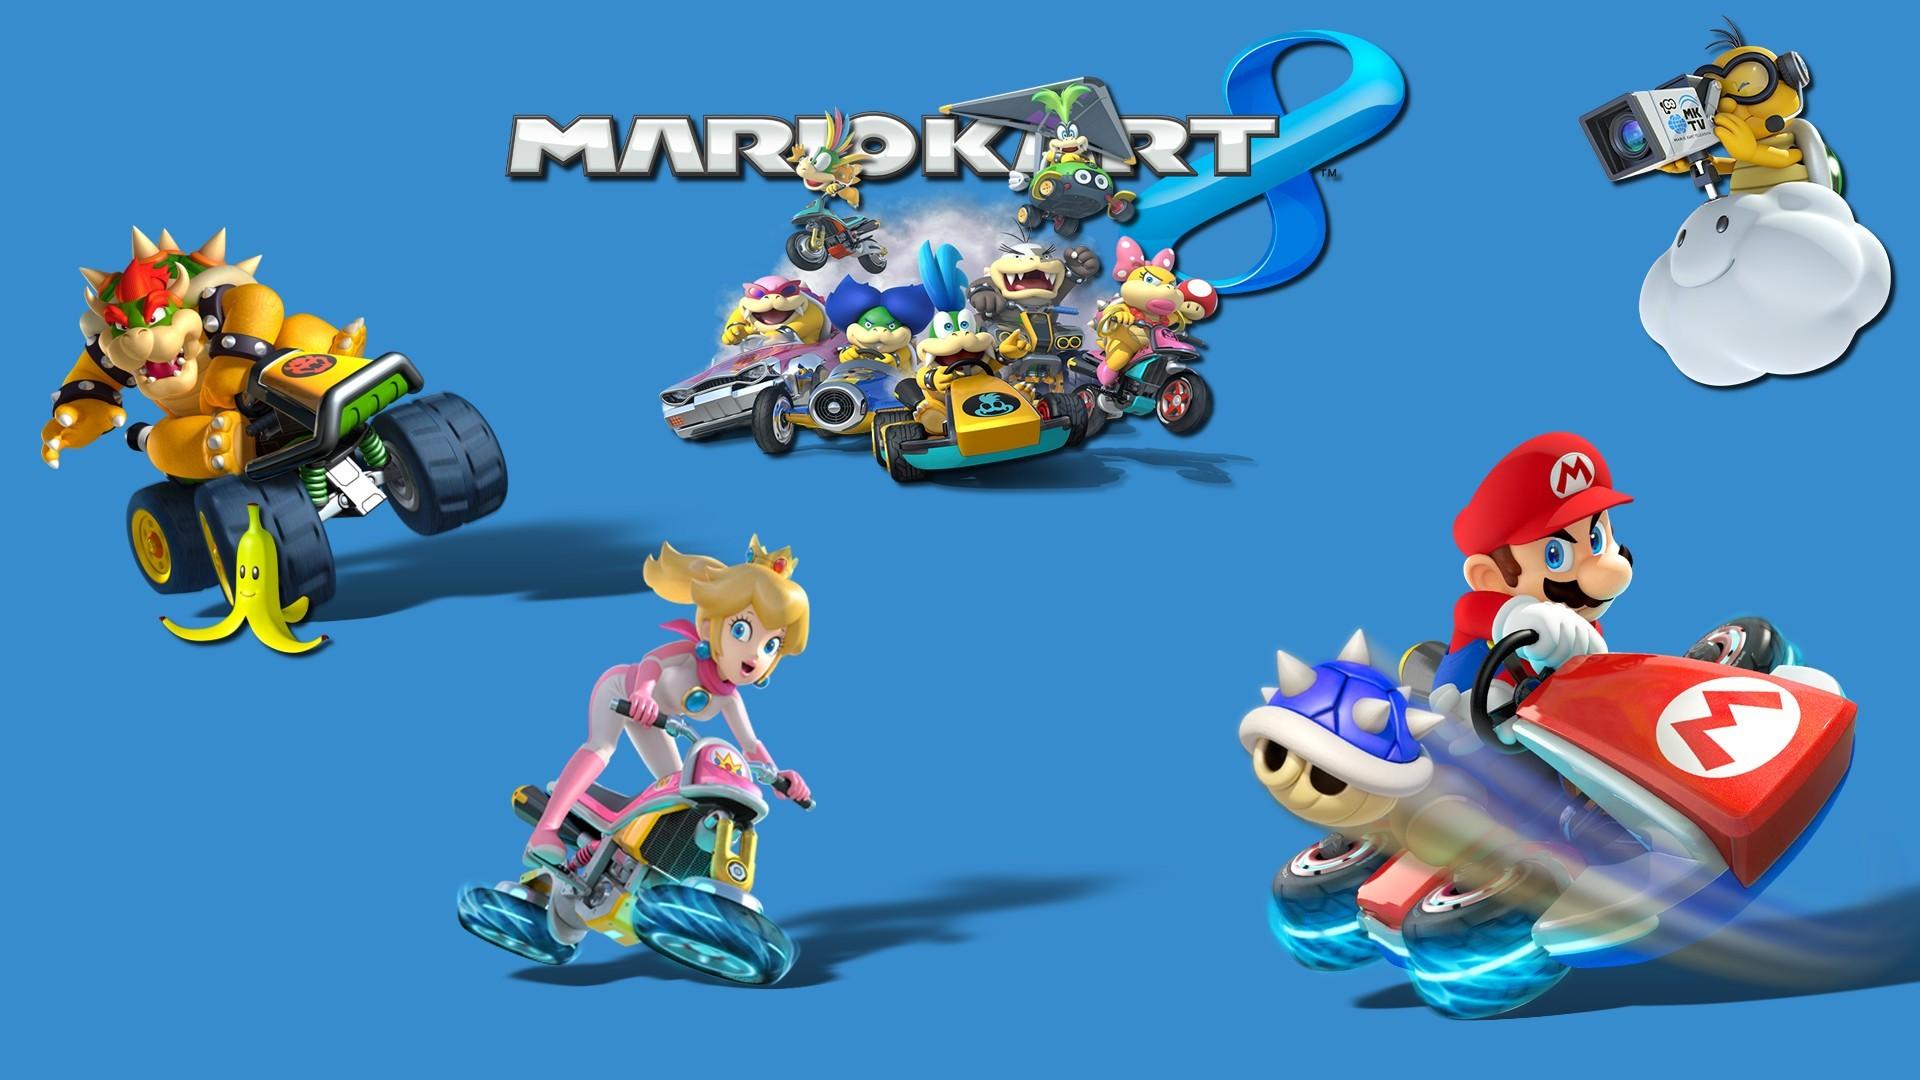 Mario Kart 8, Video Games, Toad (character), Mario Bros., Princess Peach, Nintendo  Wallpapers HD / Desktop and Mobile Backgrounds